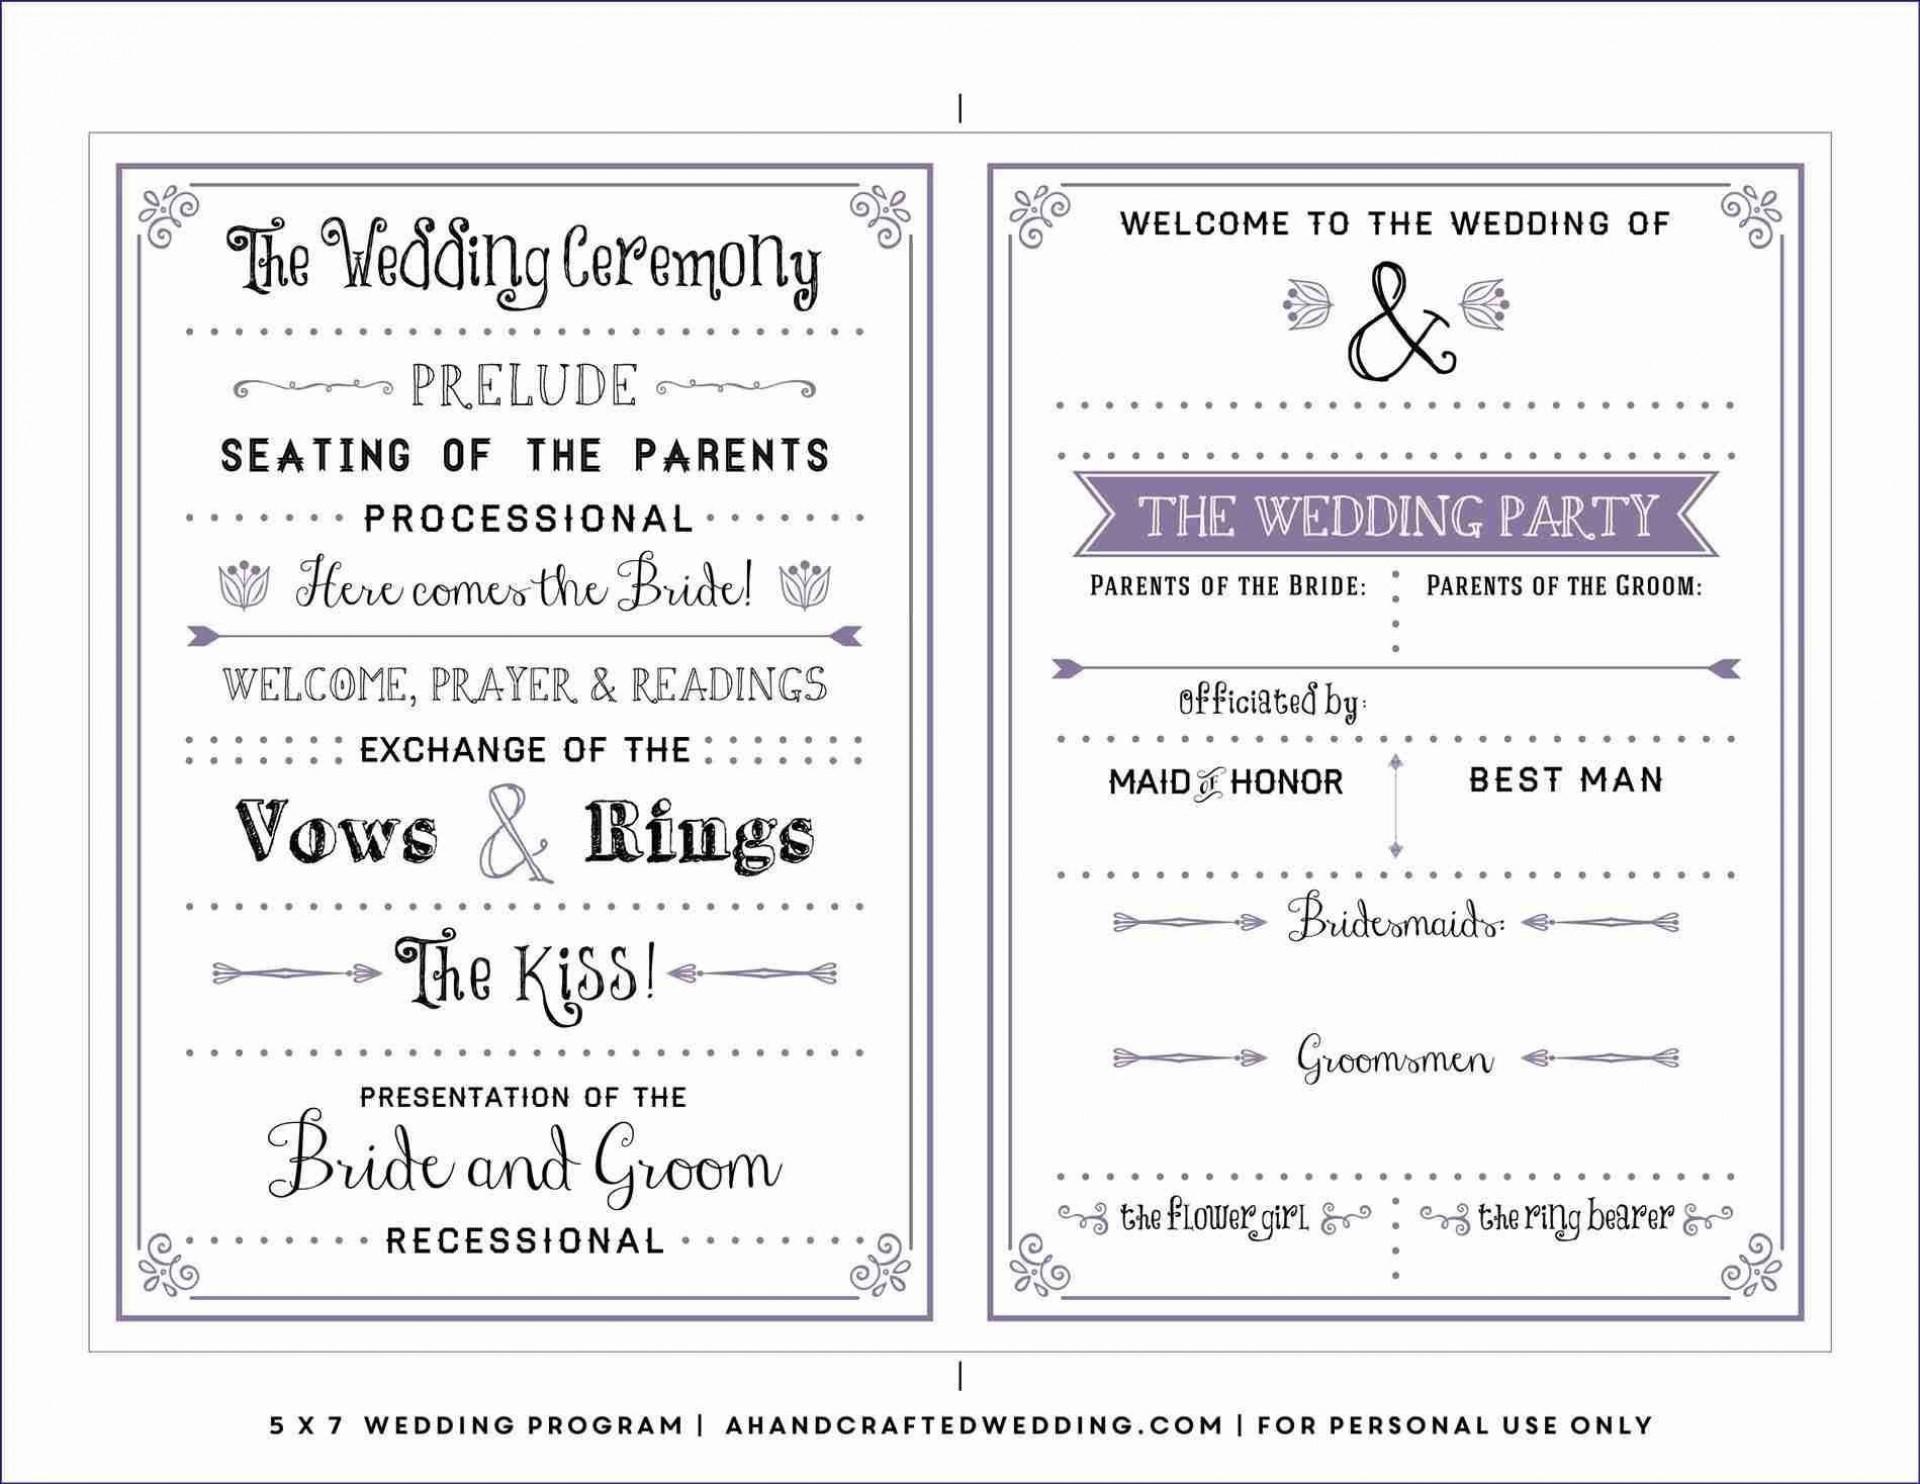 004 Best Free Wedding Program Template Example  Templates Pdf Download Fan Word1920